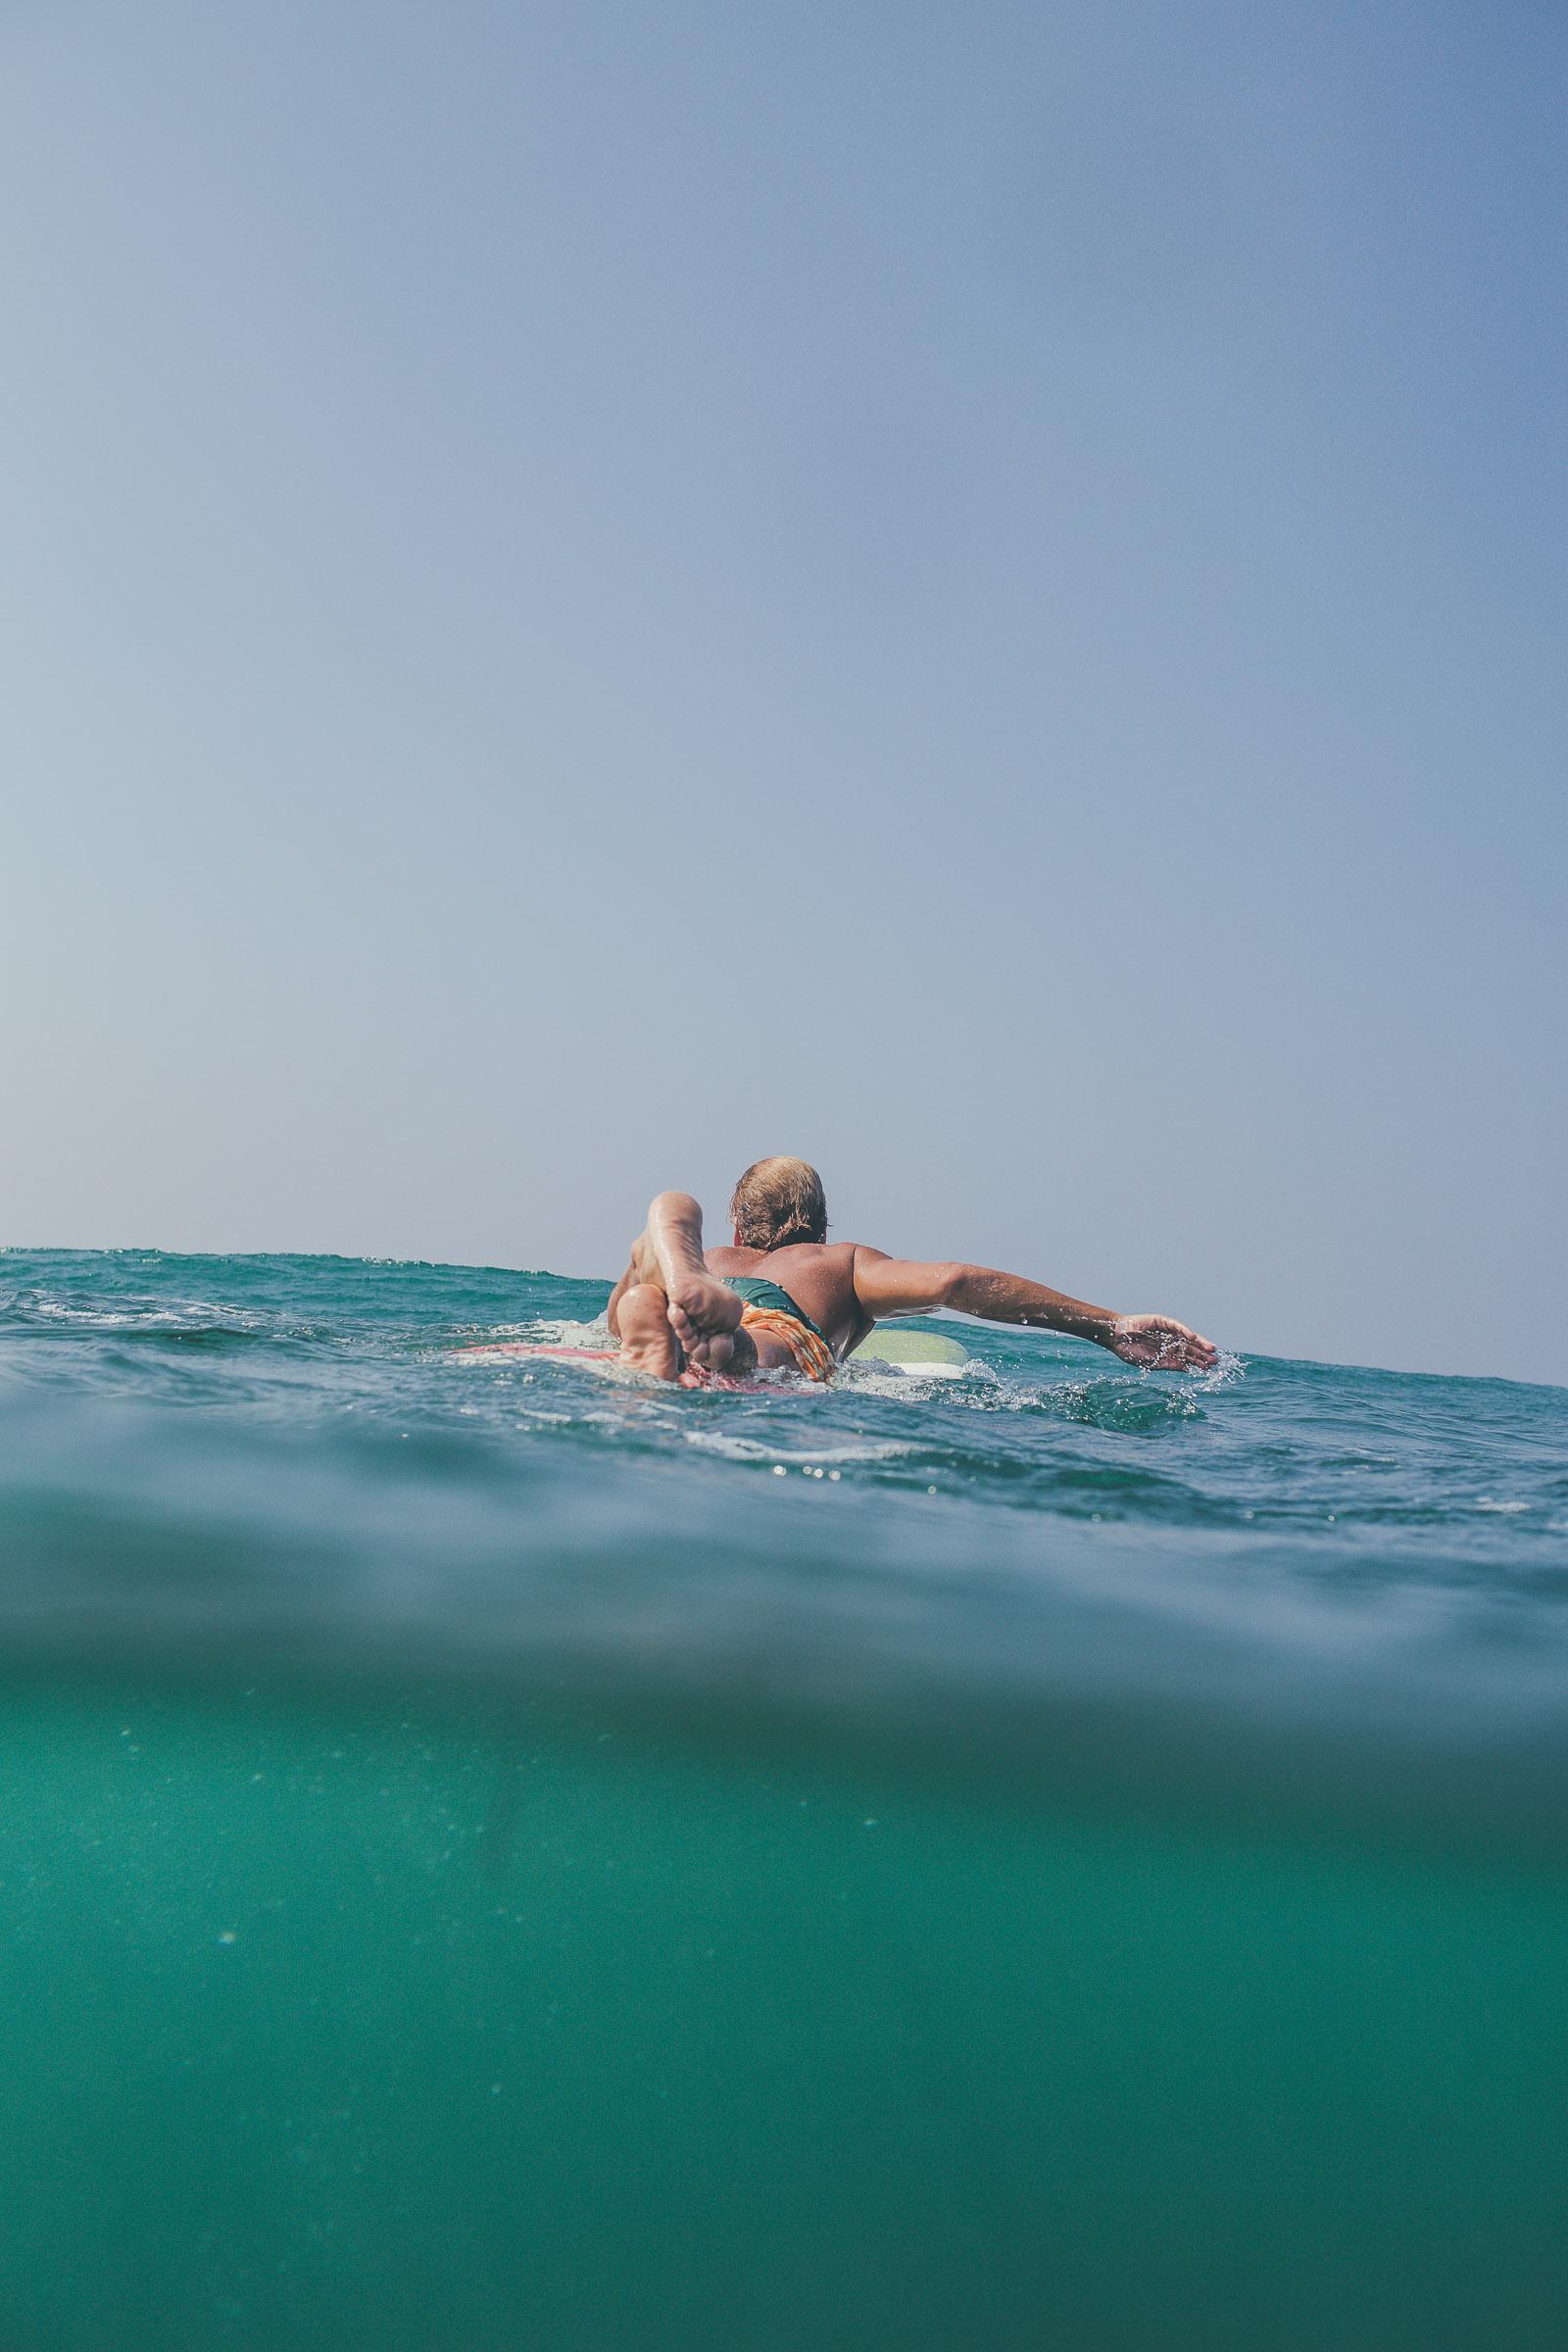 Sunshinestories-Sri-Lanka-Medawatta-Medawata-Meda-Watta-Mada-surf-Lonboard-Surfing-Wave-Surf-School-Camp-Yoga-Studio-M06A3006